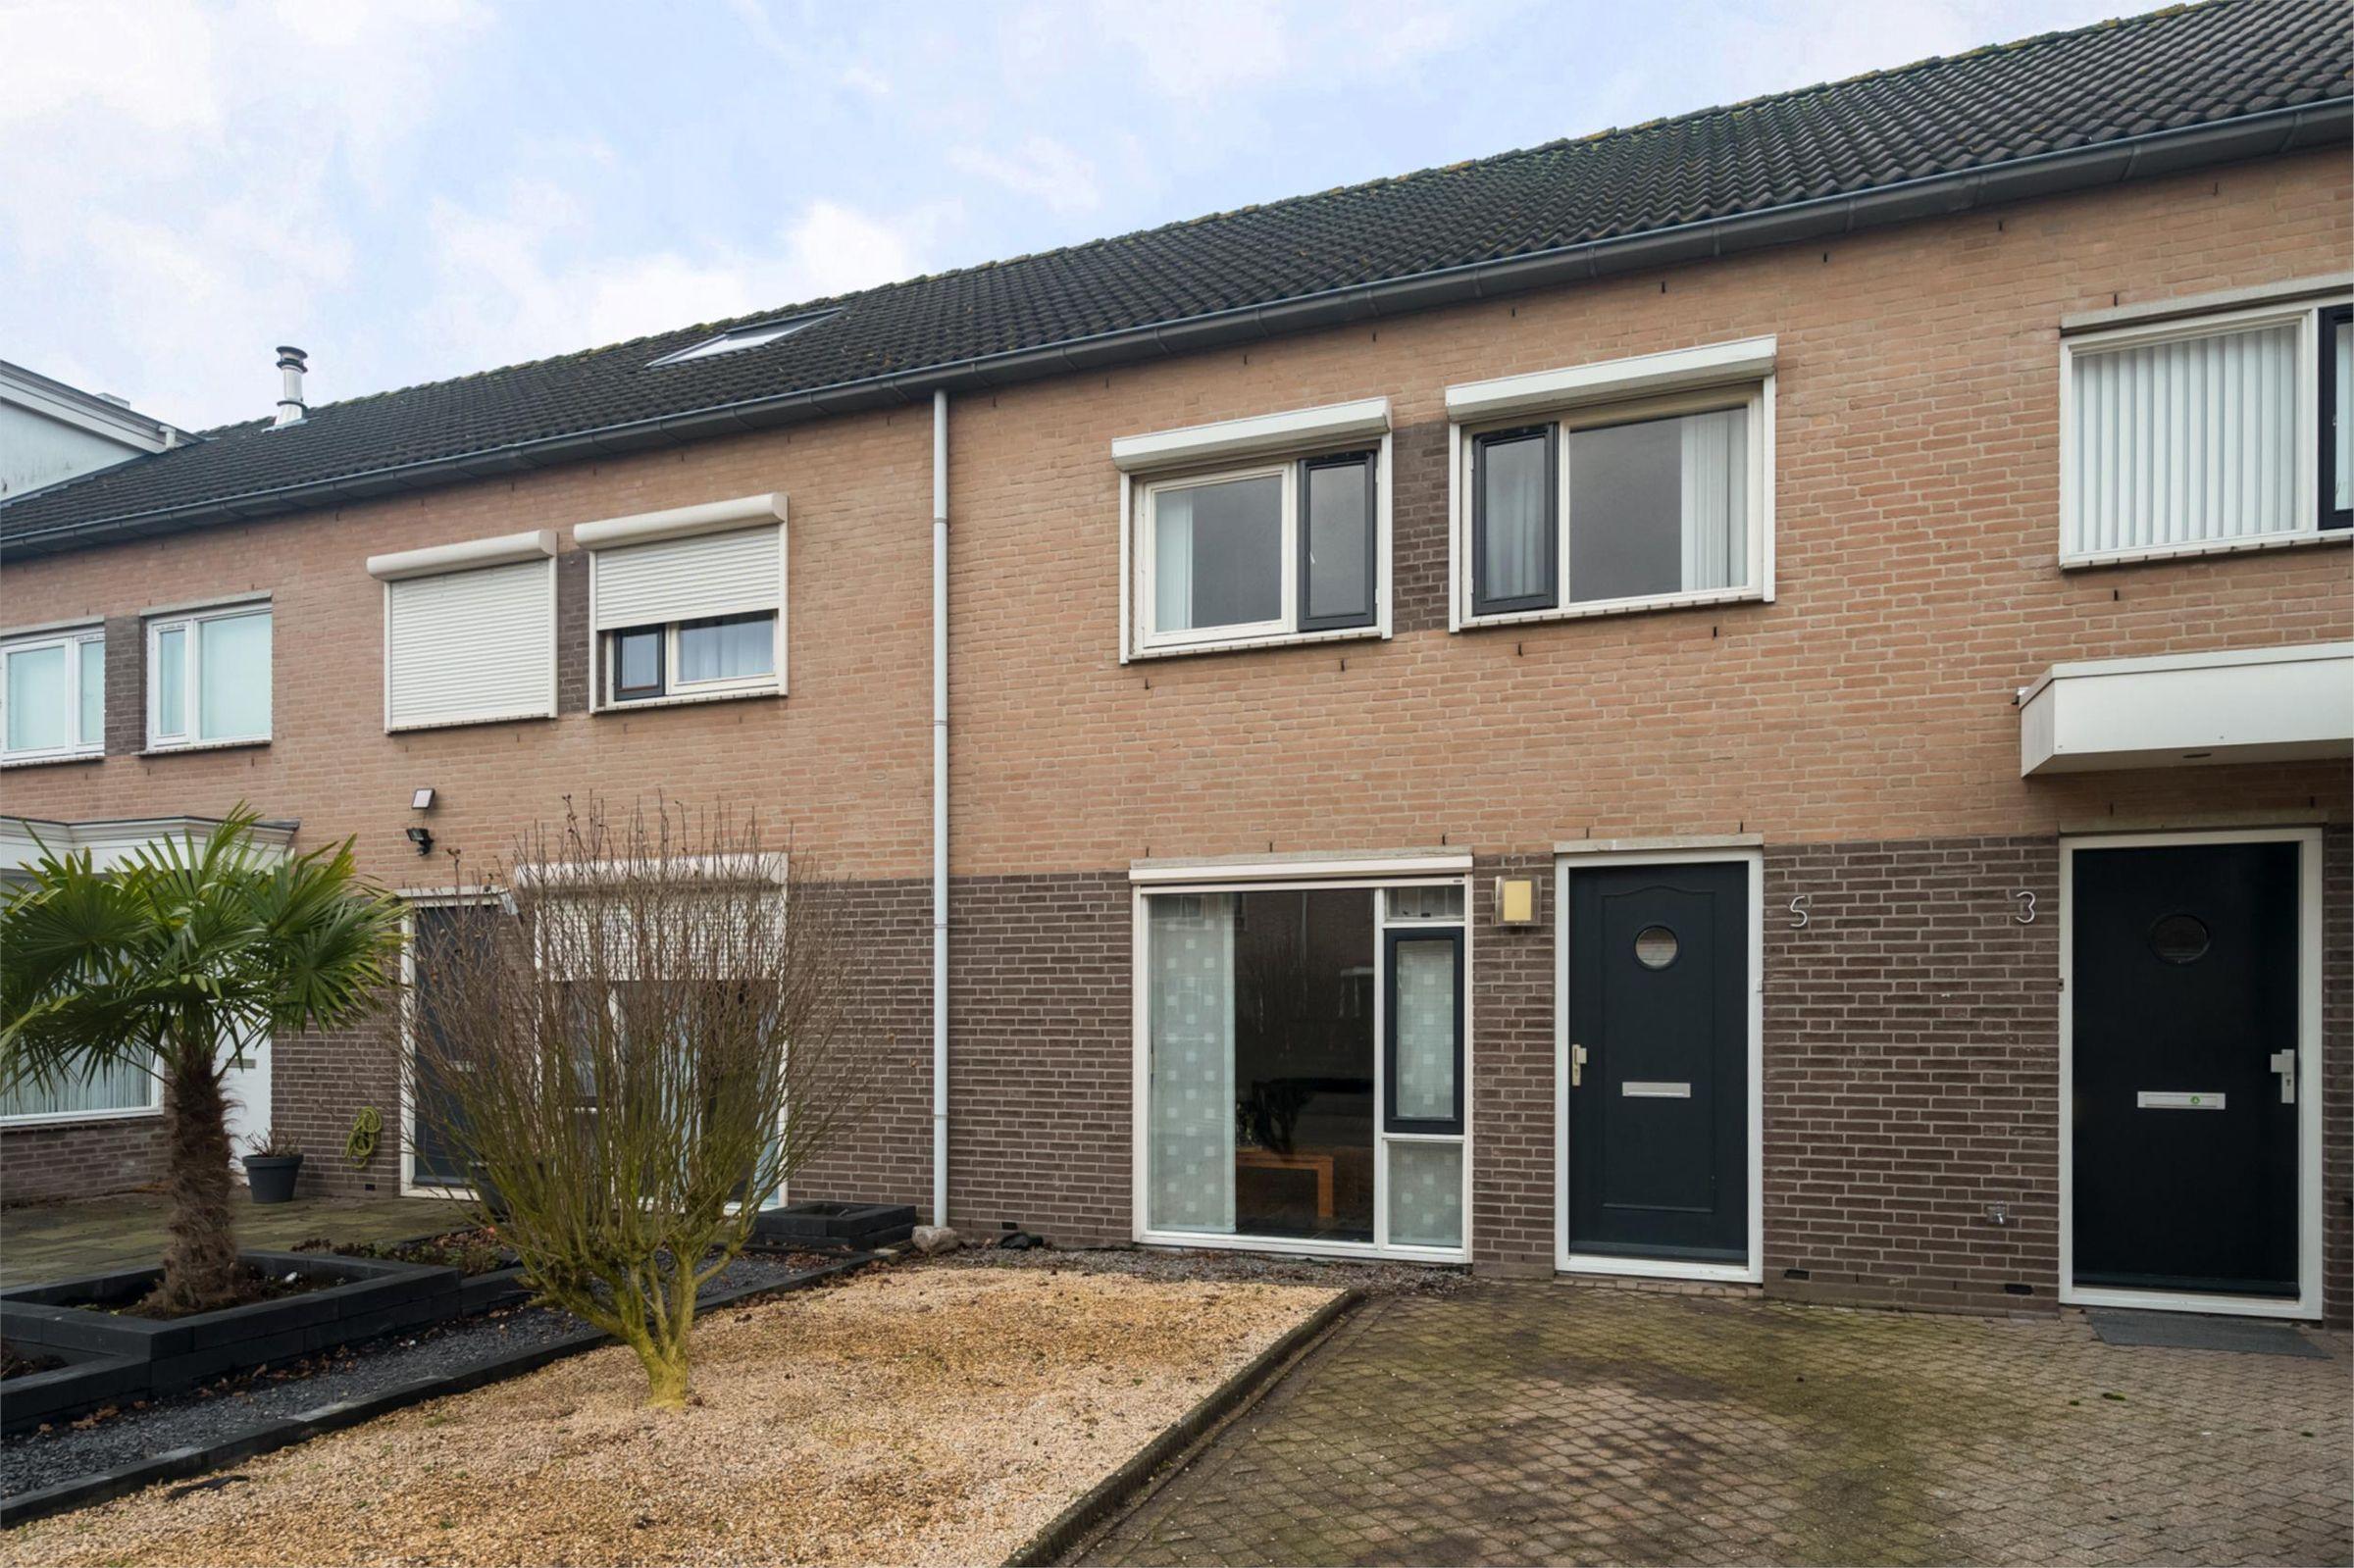 Kralingenstraat 5, Tilburg